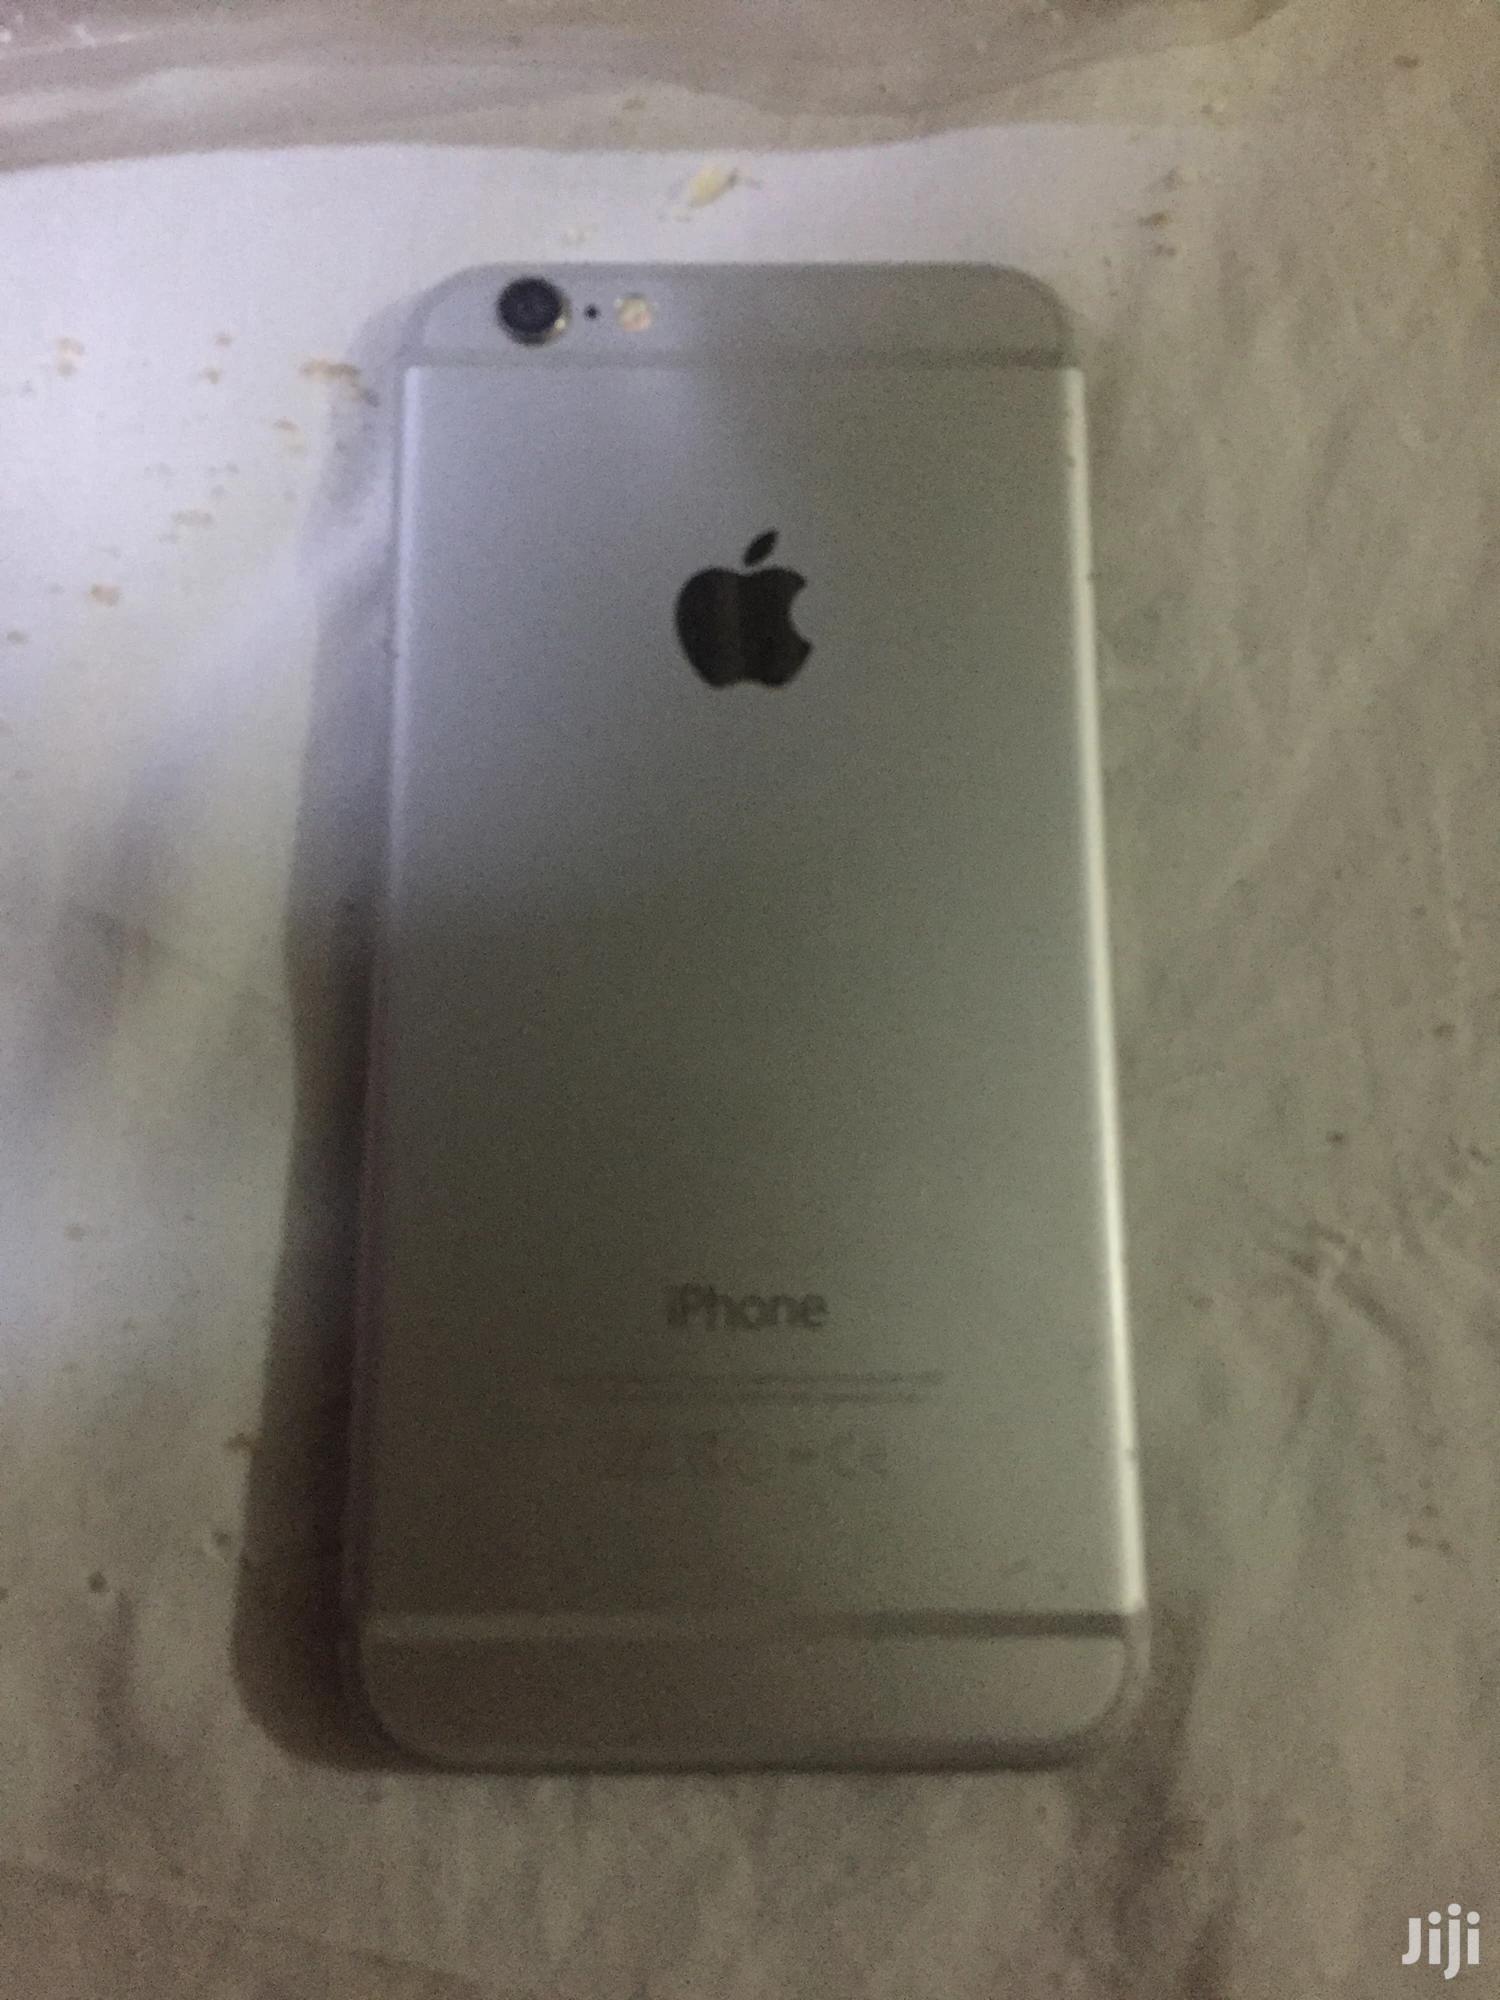 Apple iPhone 6 64 GB Gray | Mobile Phones for sale in Accra Metropolitan, Greater Accra, Ghana